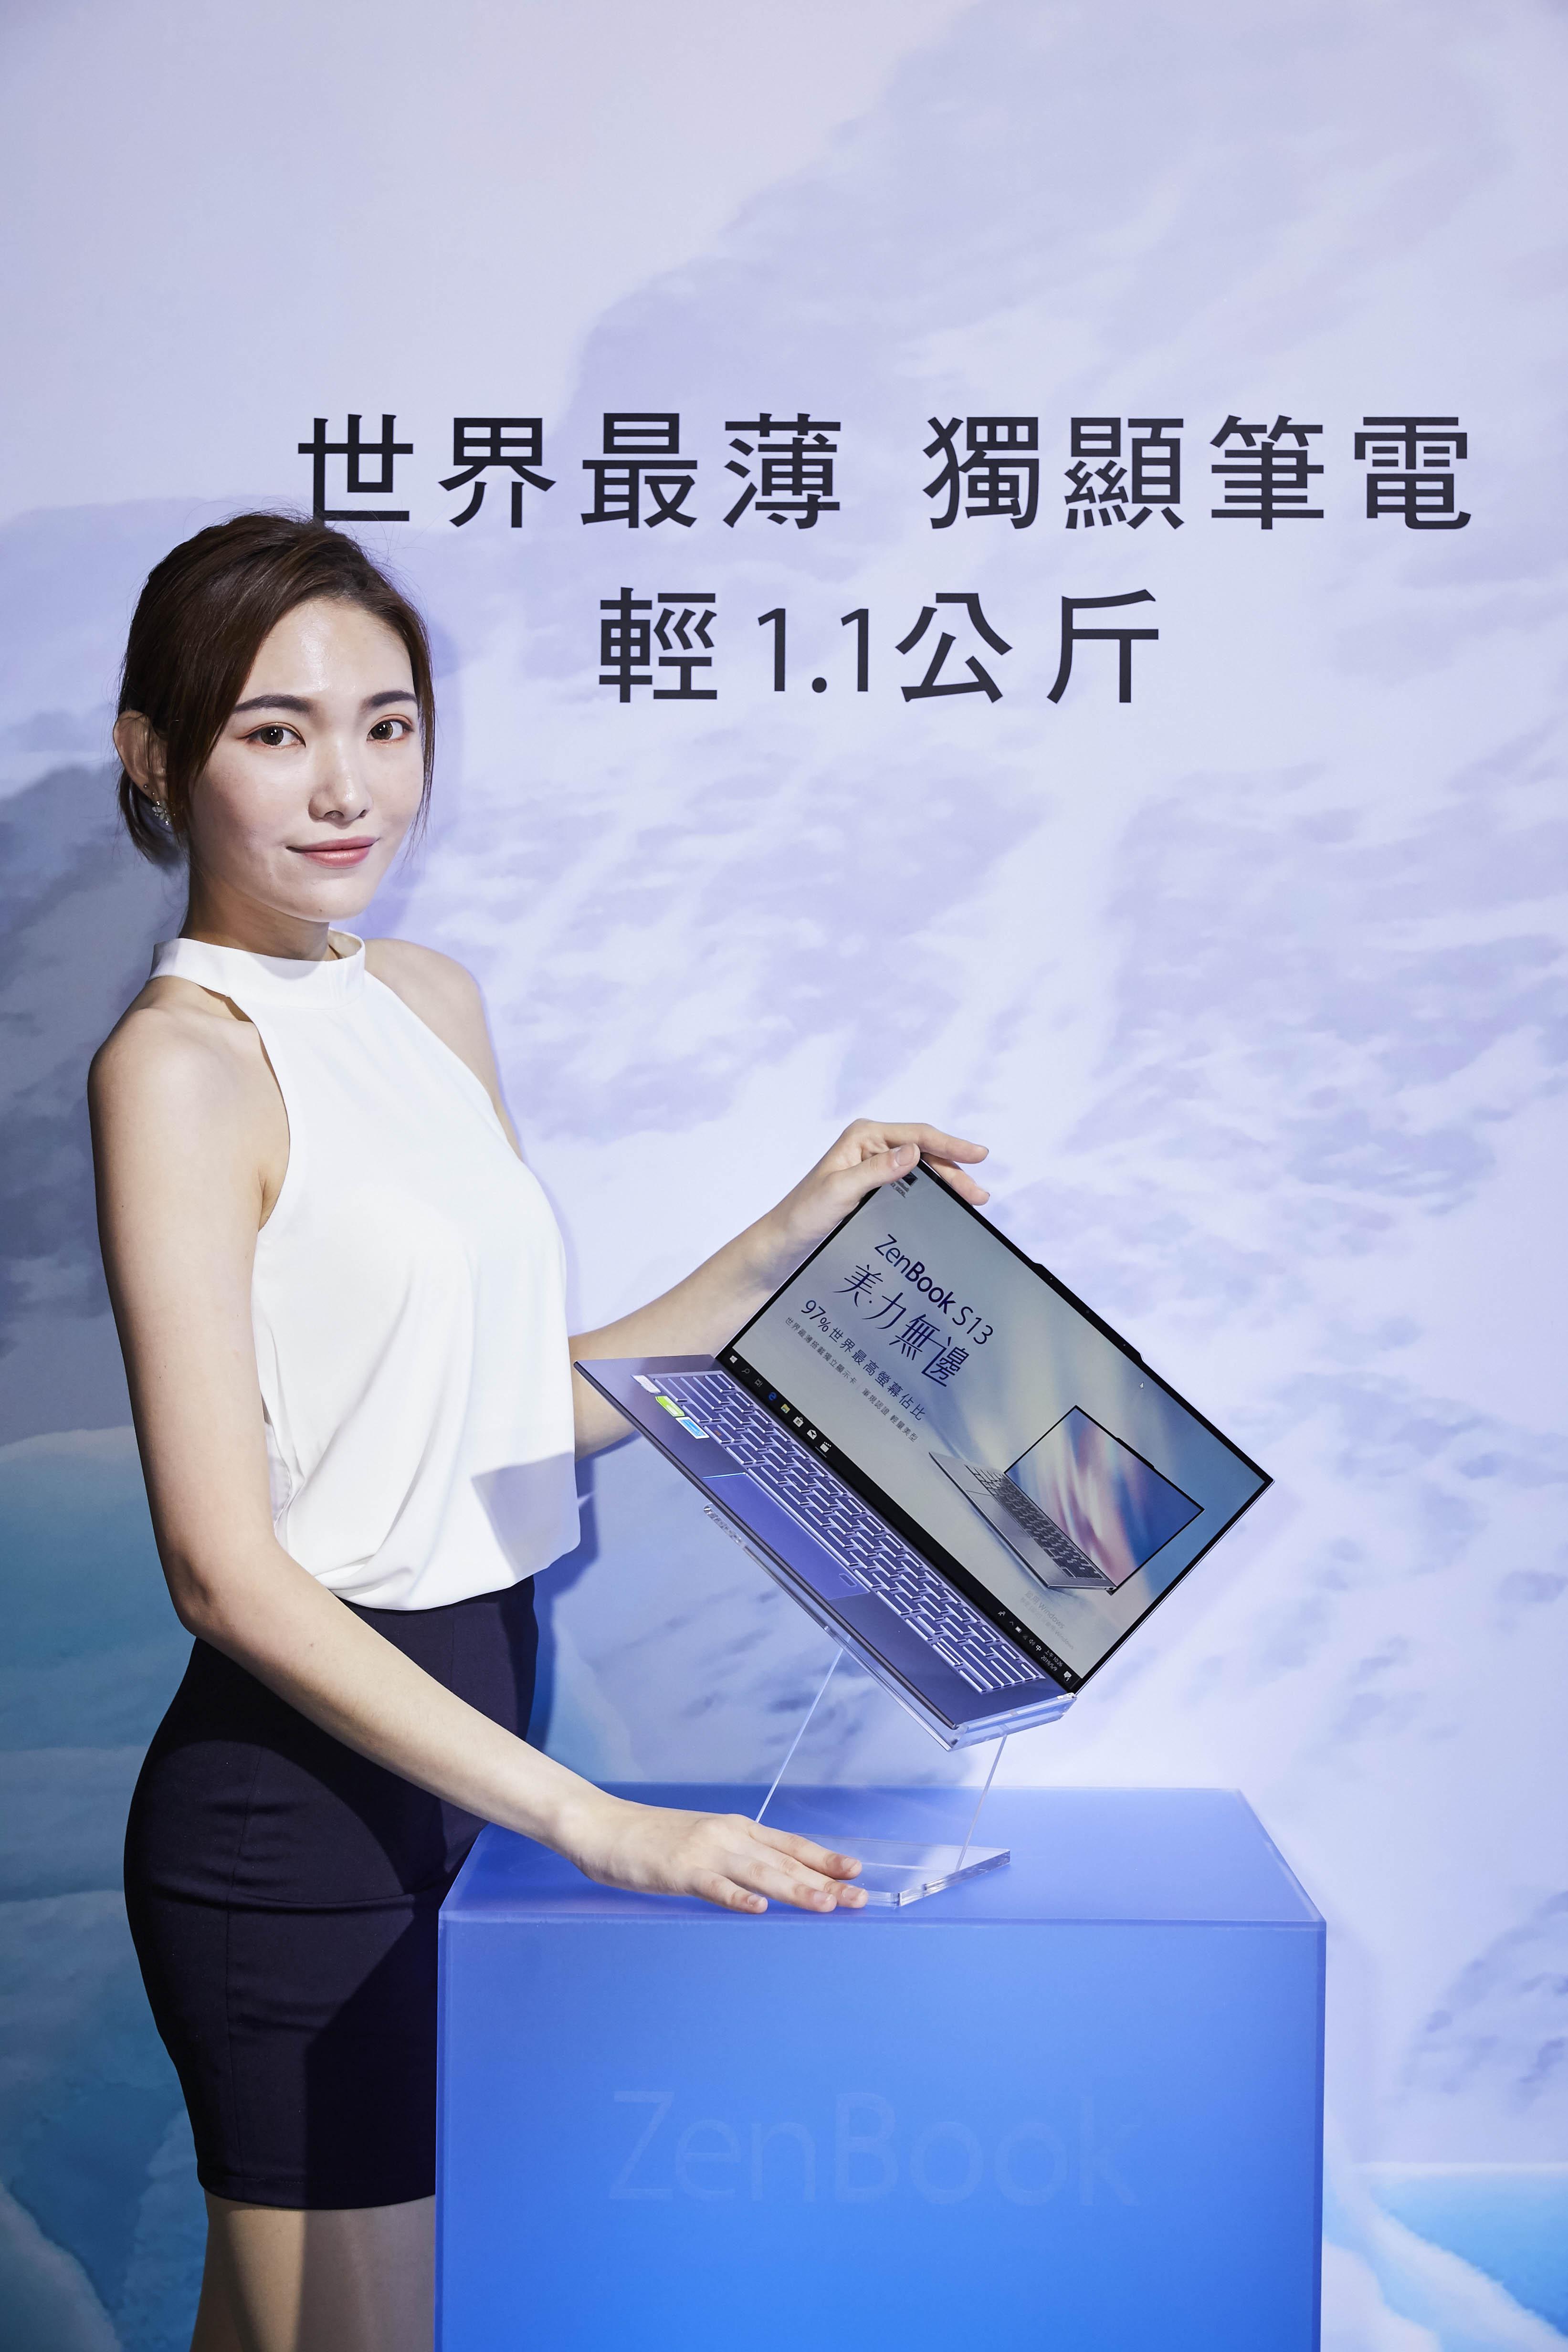 ASUS ZenBook S13是世界最薄的NVIDIA MX150獨立顯示卡筆電。